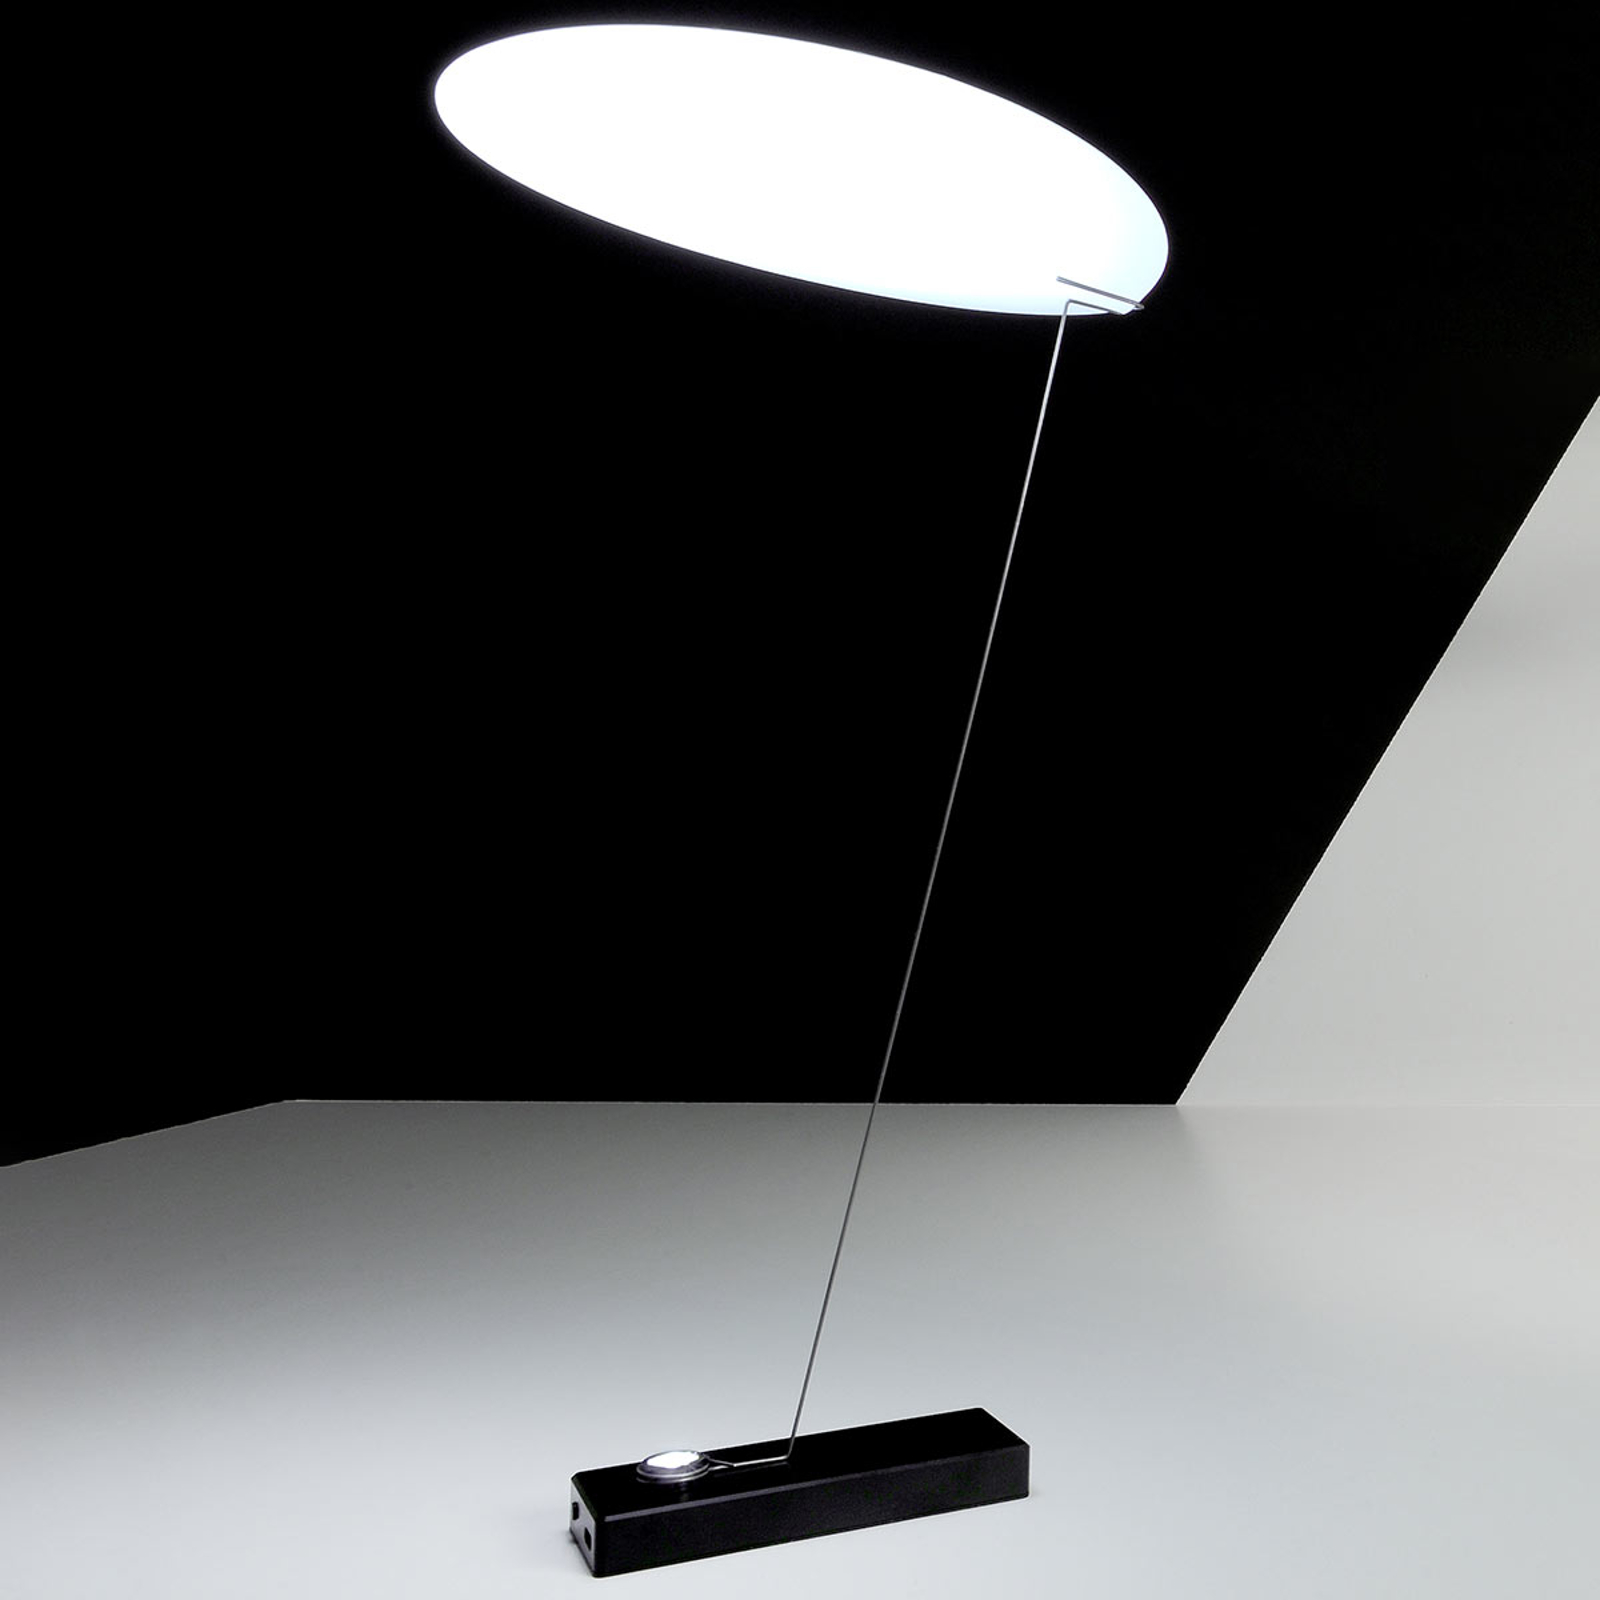 Ingo Maurer Koyoo - LED-Designer-Tischleuchte